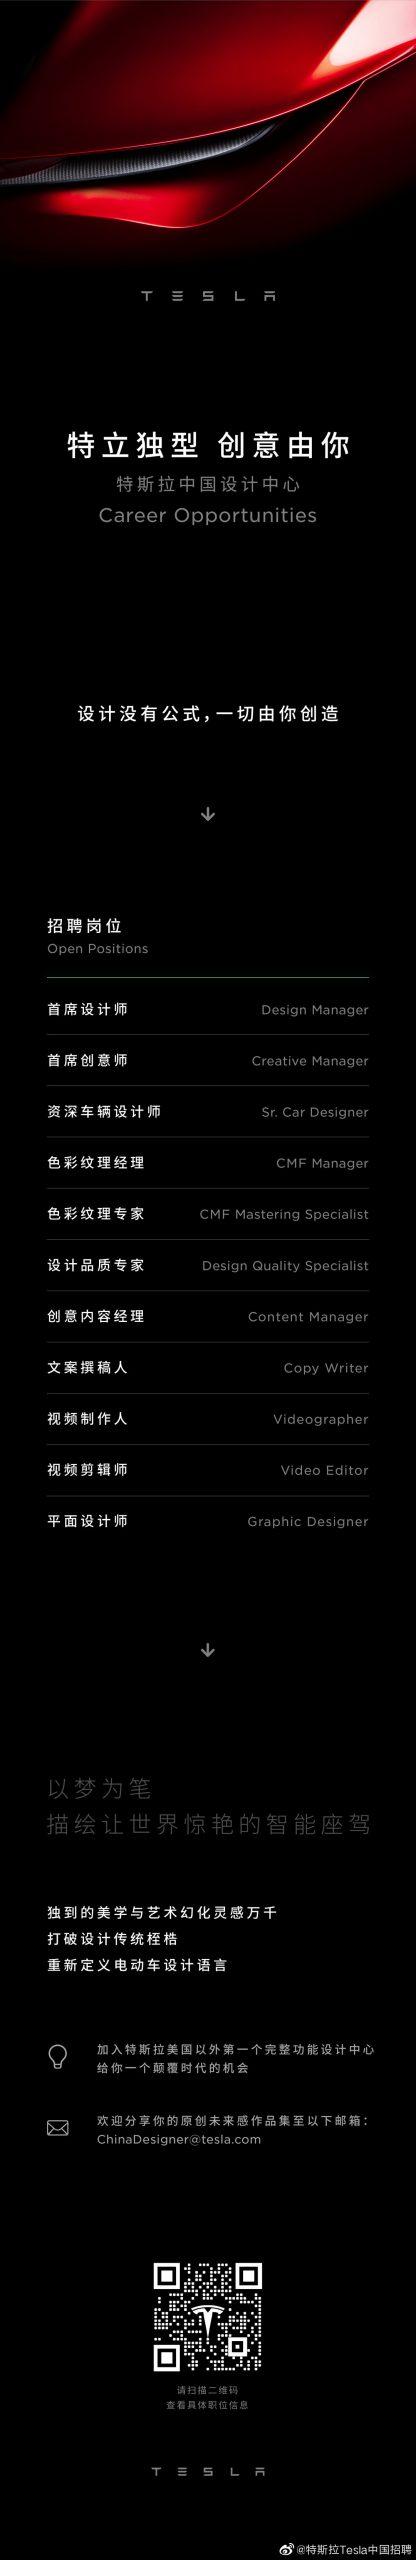 tesla-china-design-center-job-listing